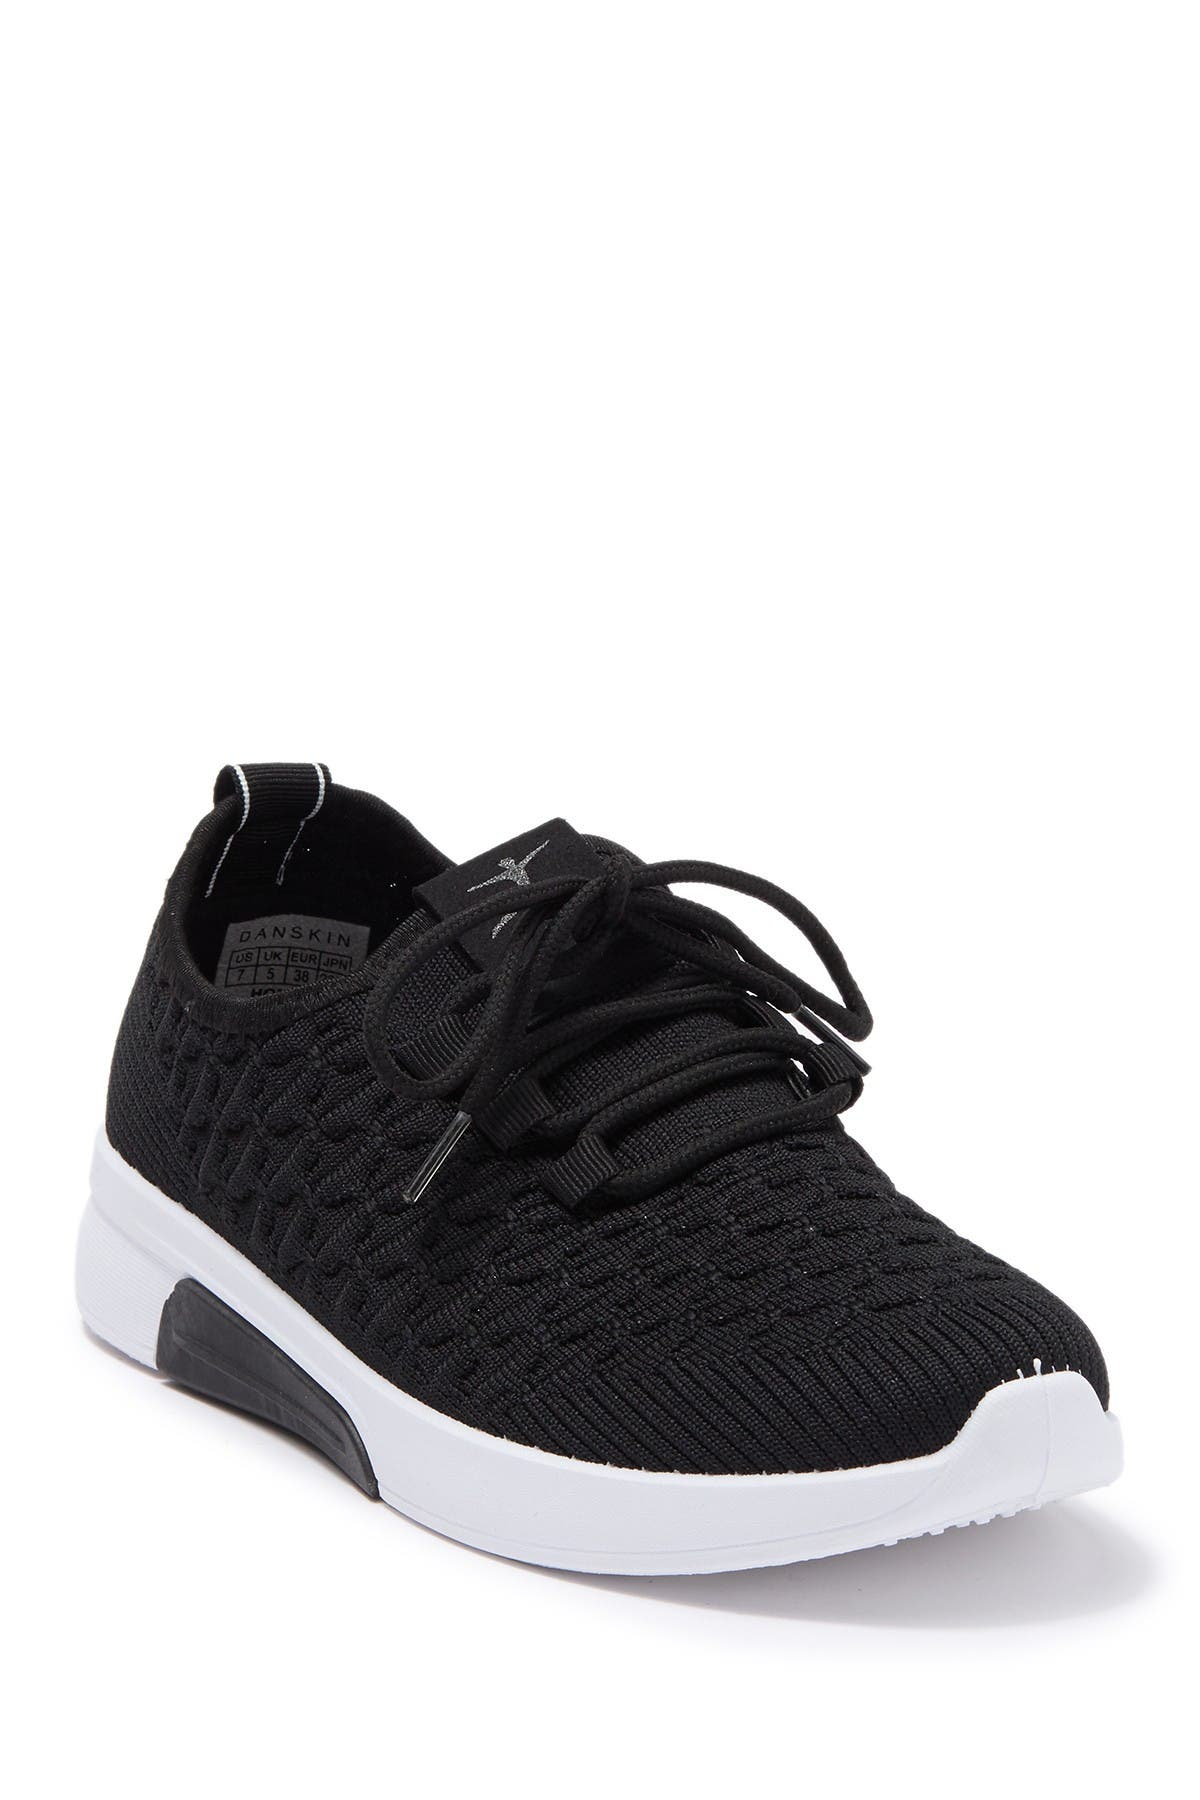 Image of DANSKIN Honor Textured Knit Sneaker